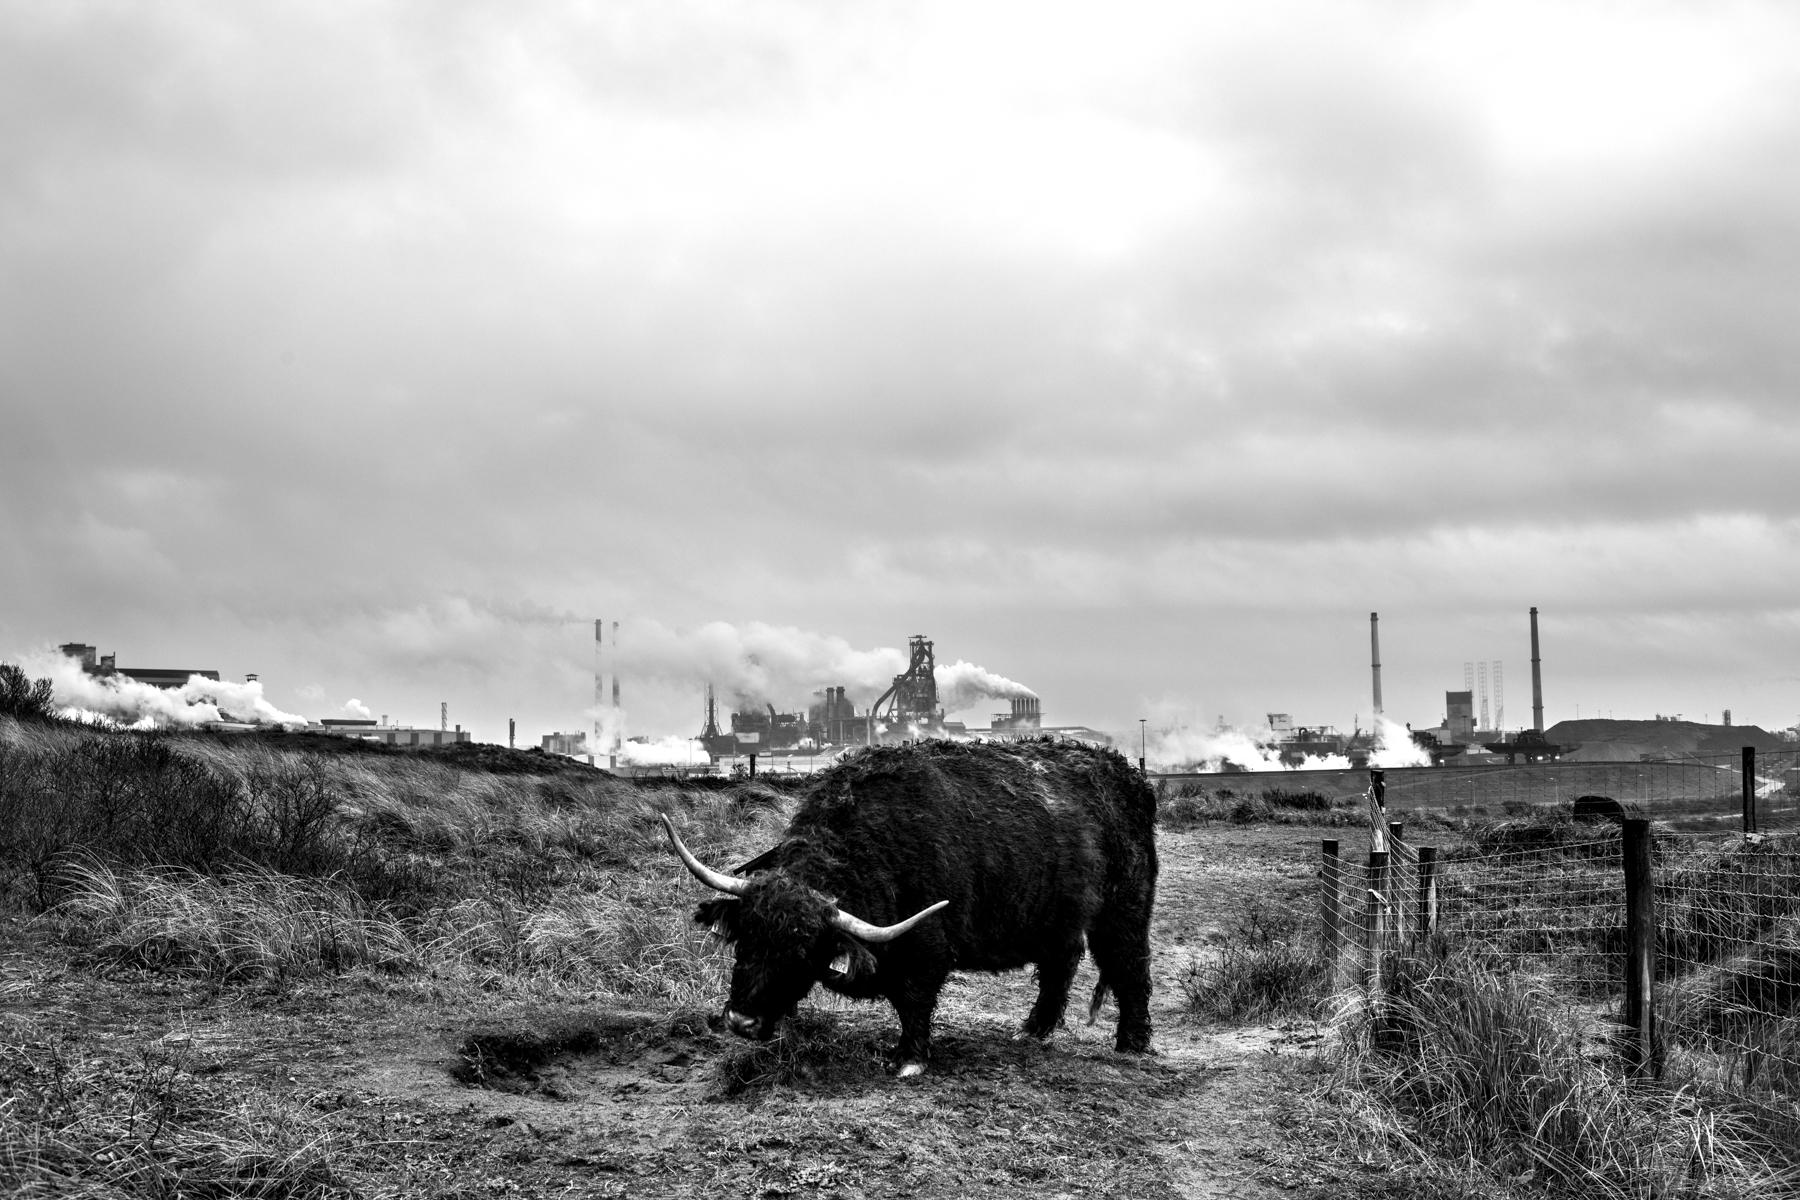 An Irish cow is rubbing itself against a wood-stick in the dunes, facing the giant steel factory in Wijk aan Zee